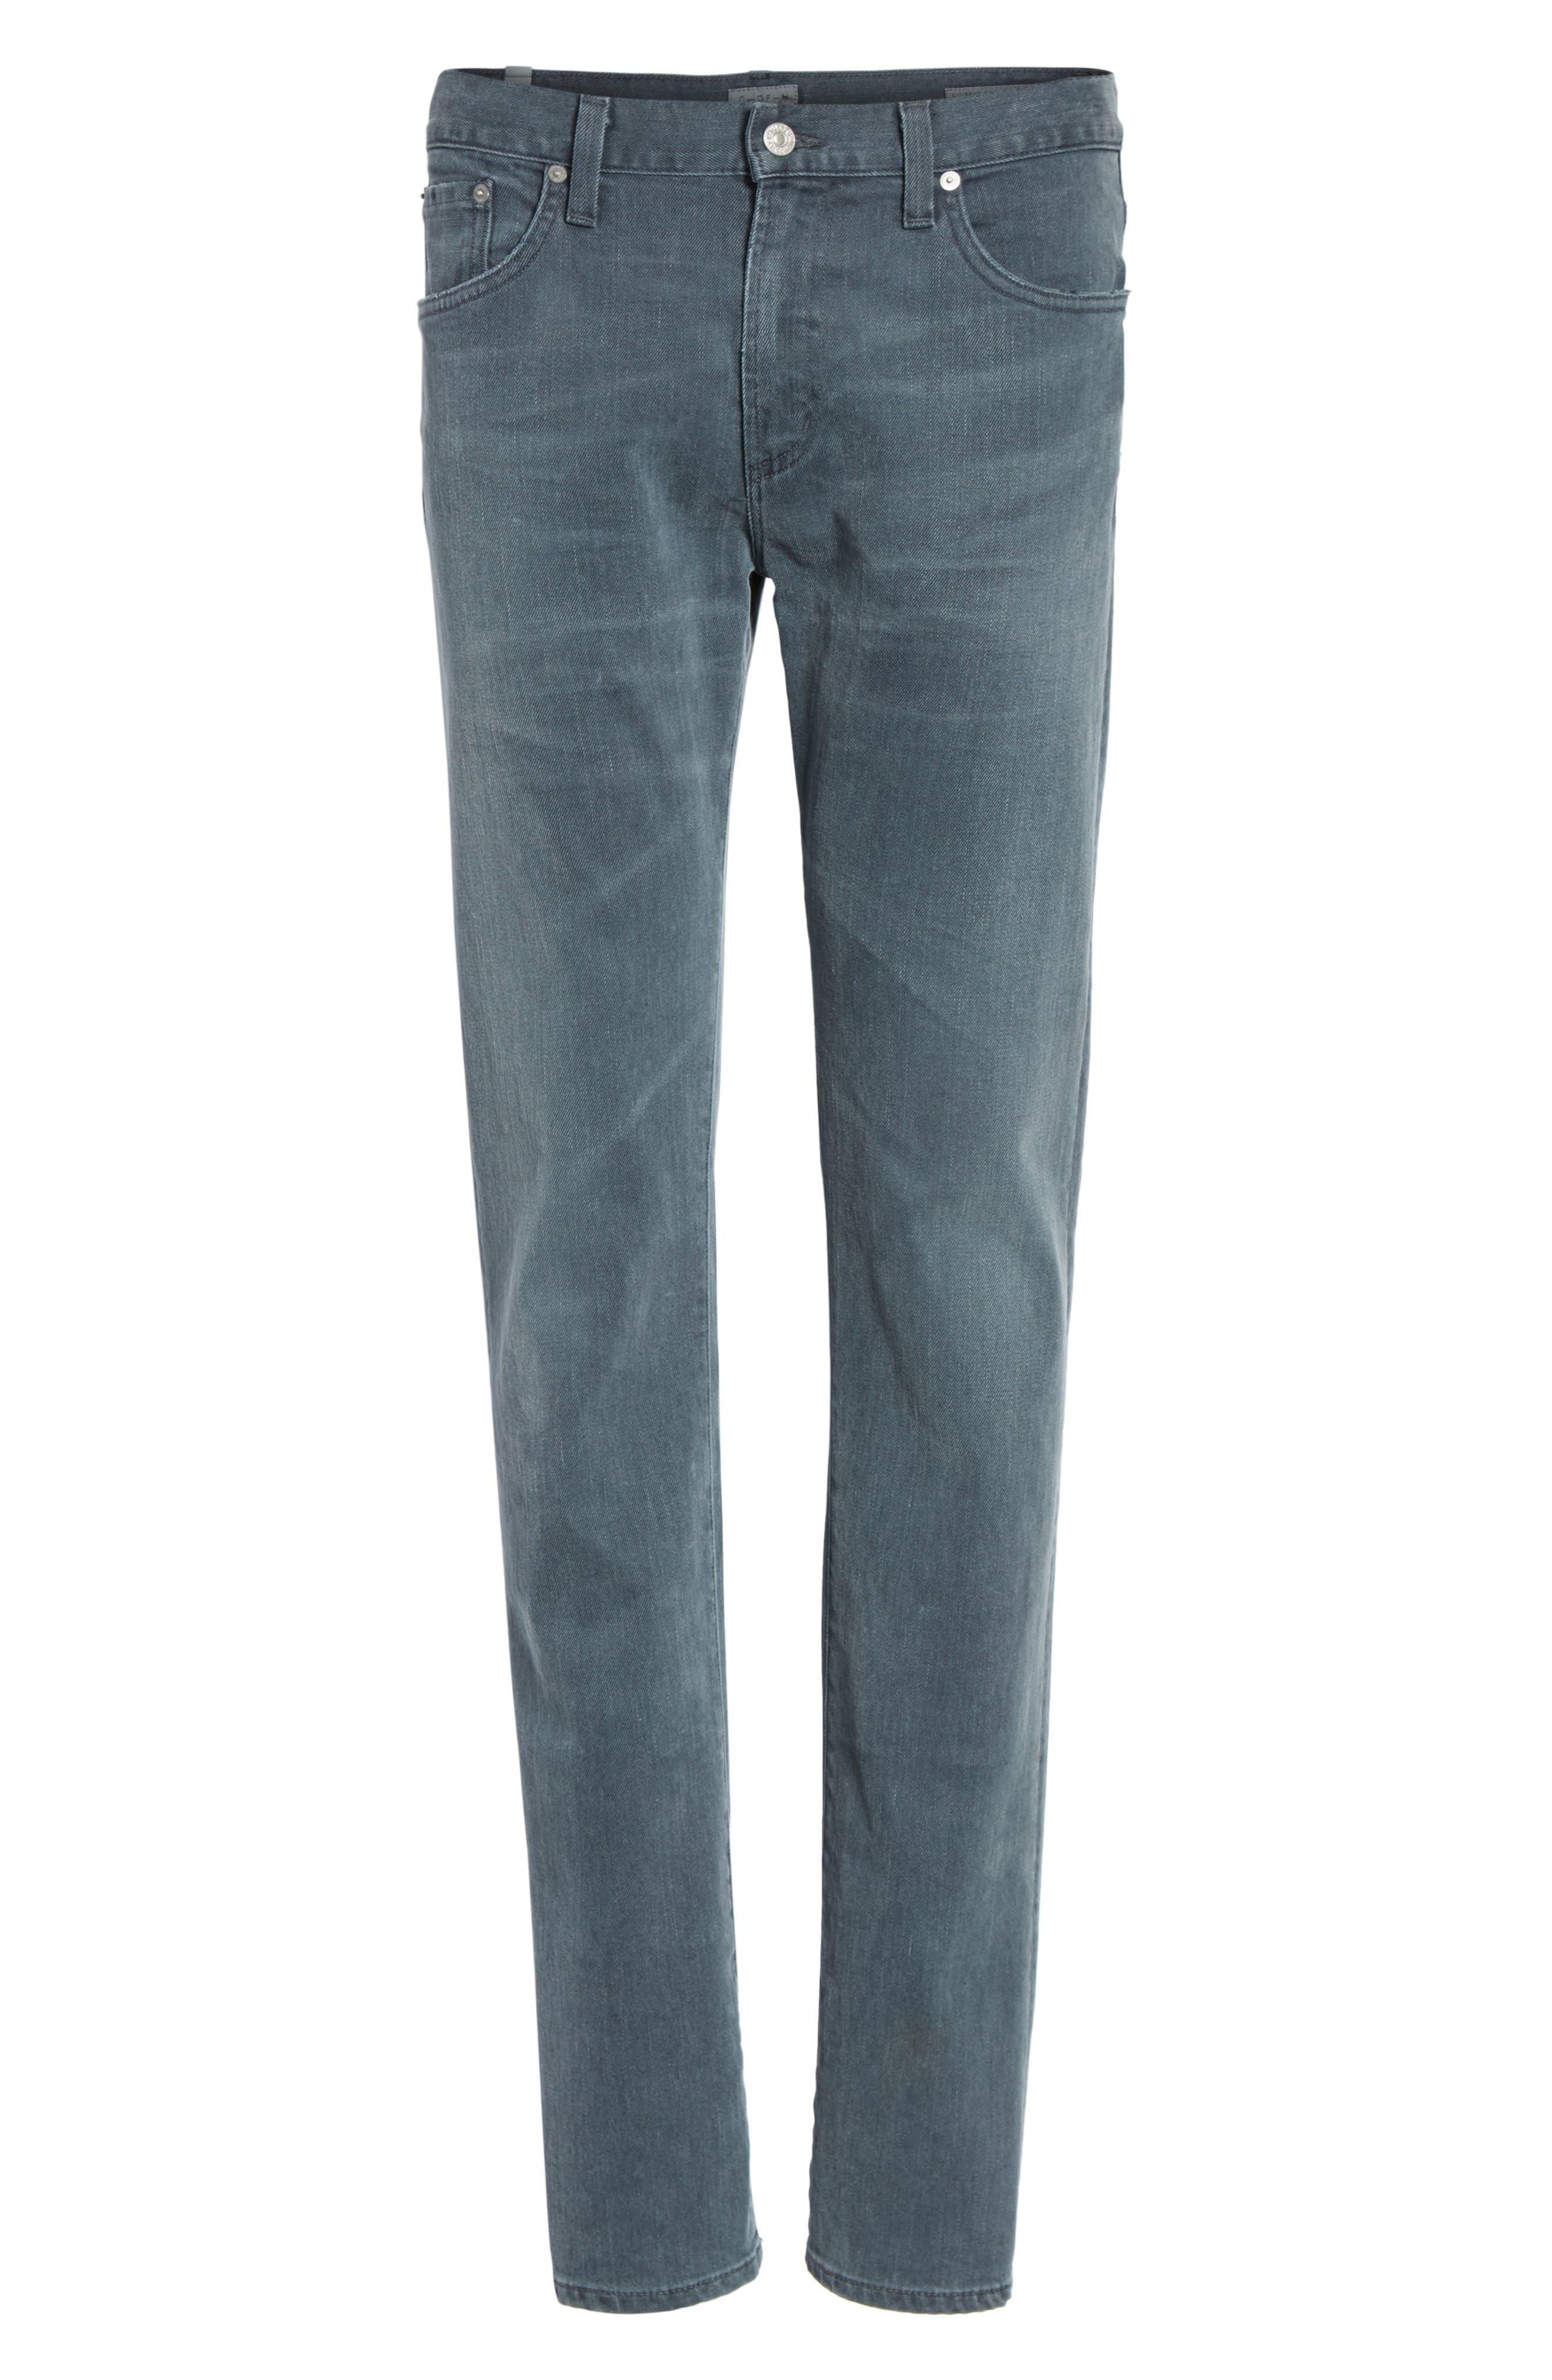 Core Slim Fit Jeans,                             Alternate thumbnail 6, color,                             Grey Skies